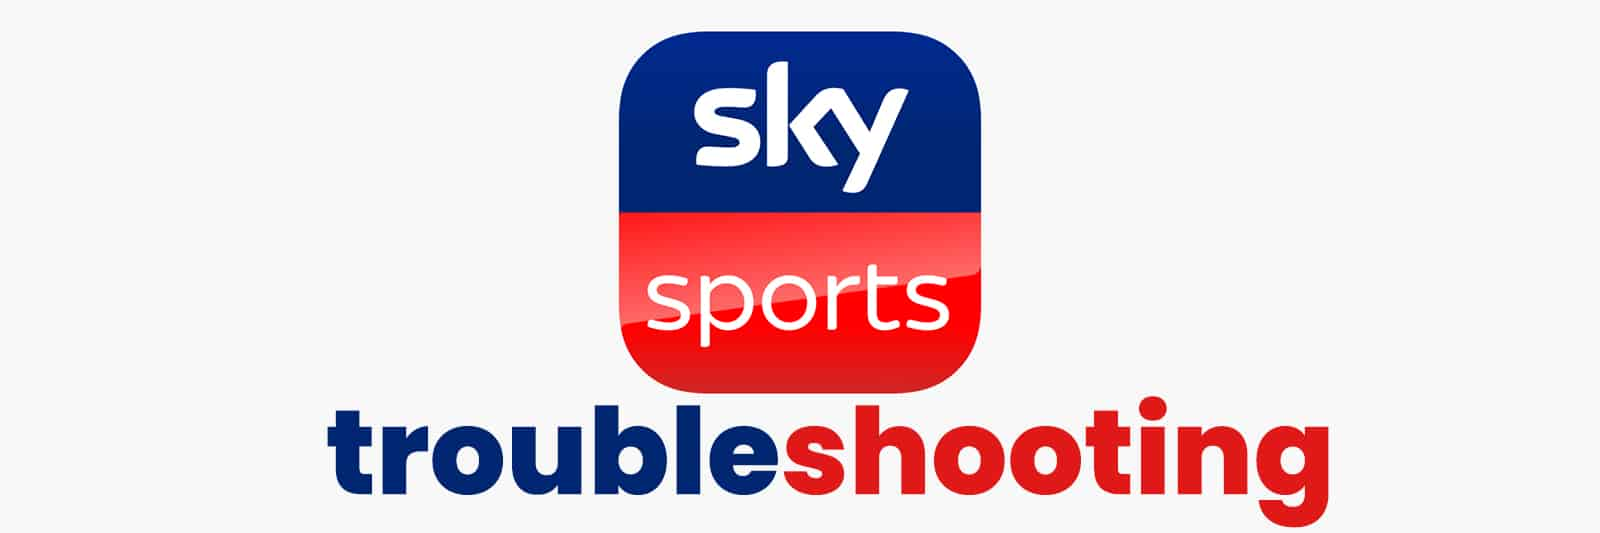 sky-sports-app-not-working